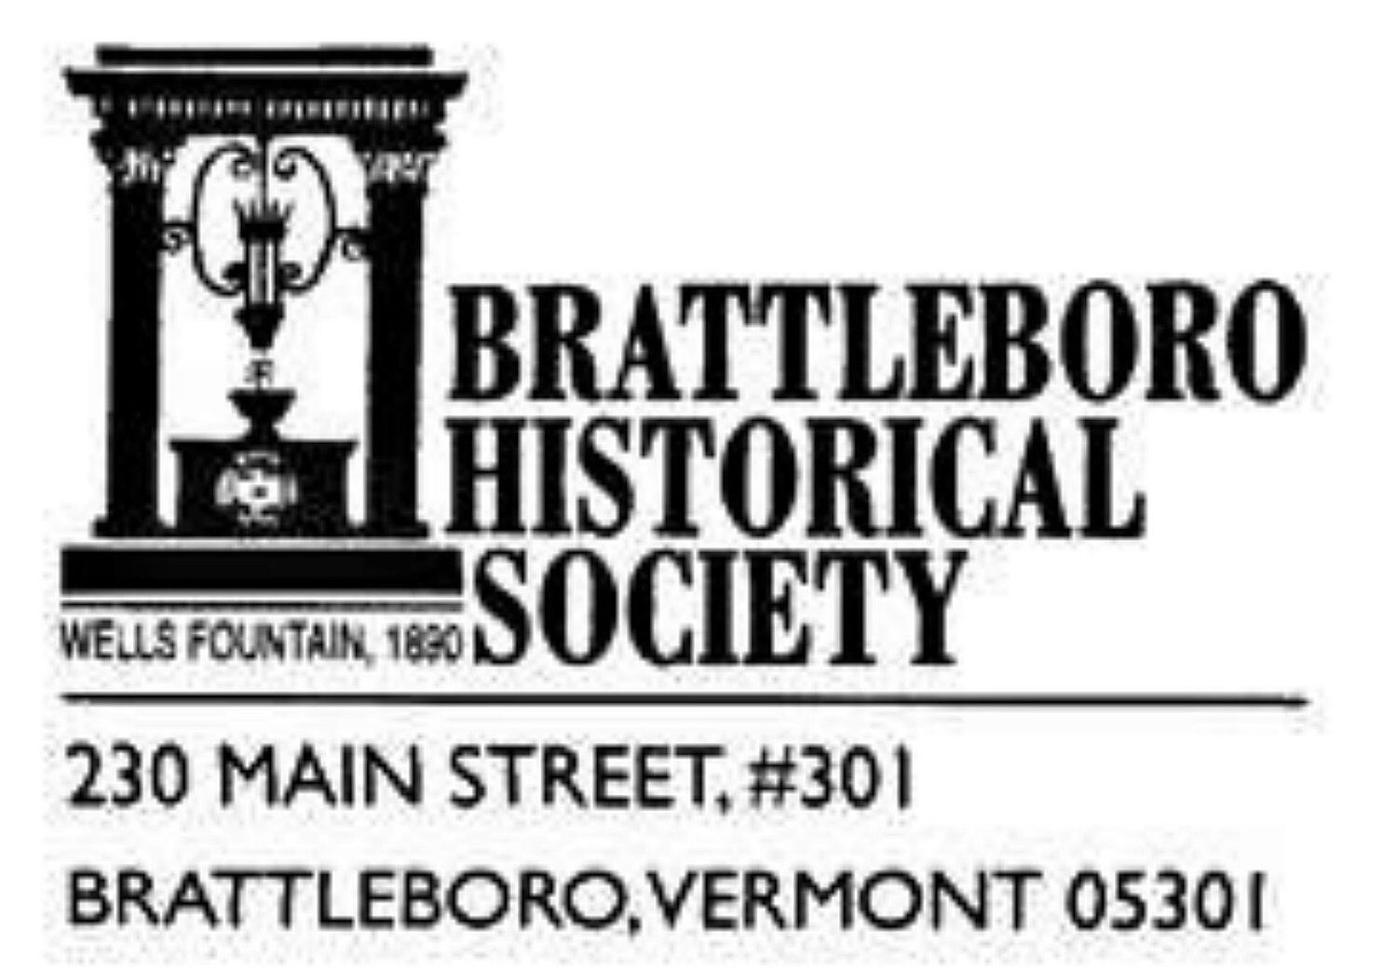 Brattleboro nurse becomes WWI hero